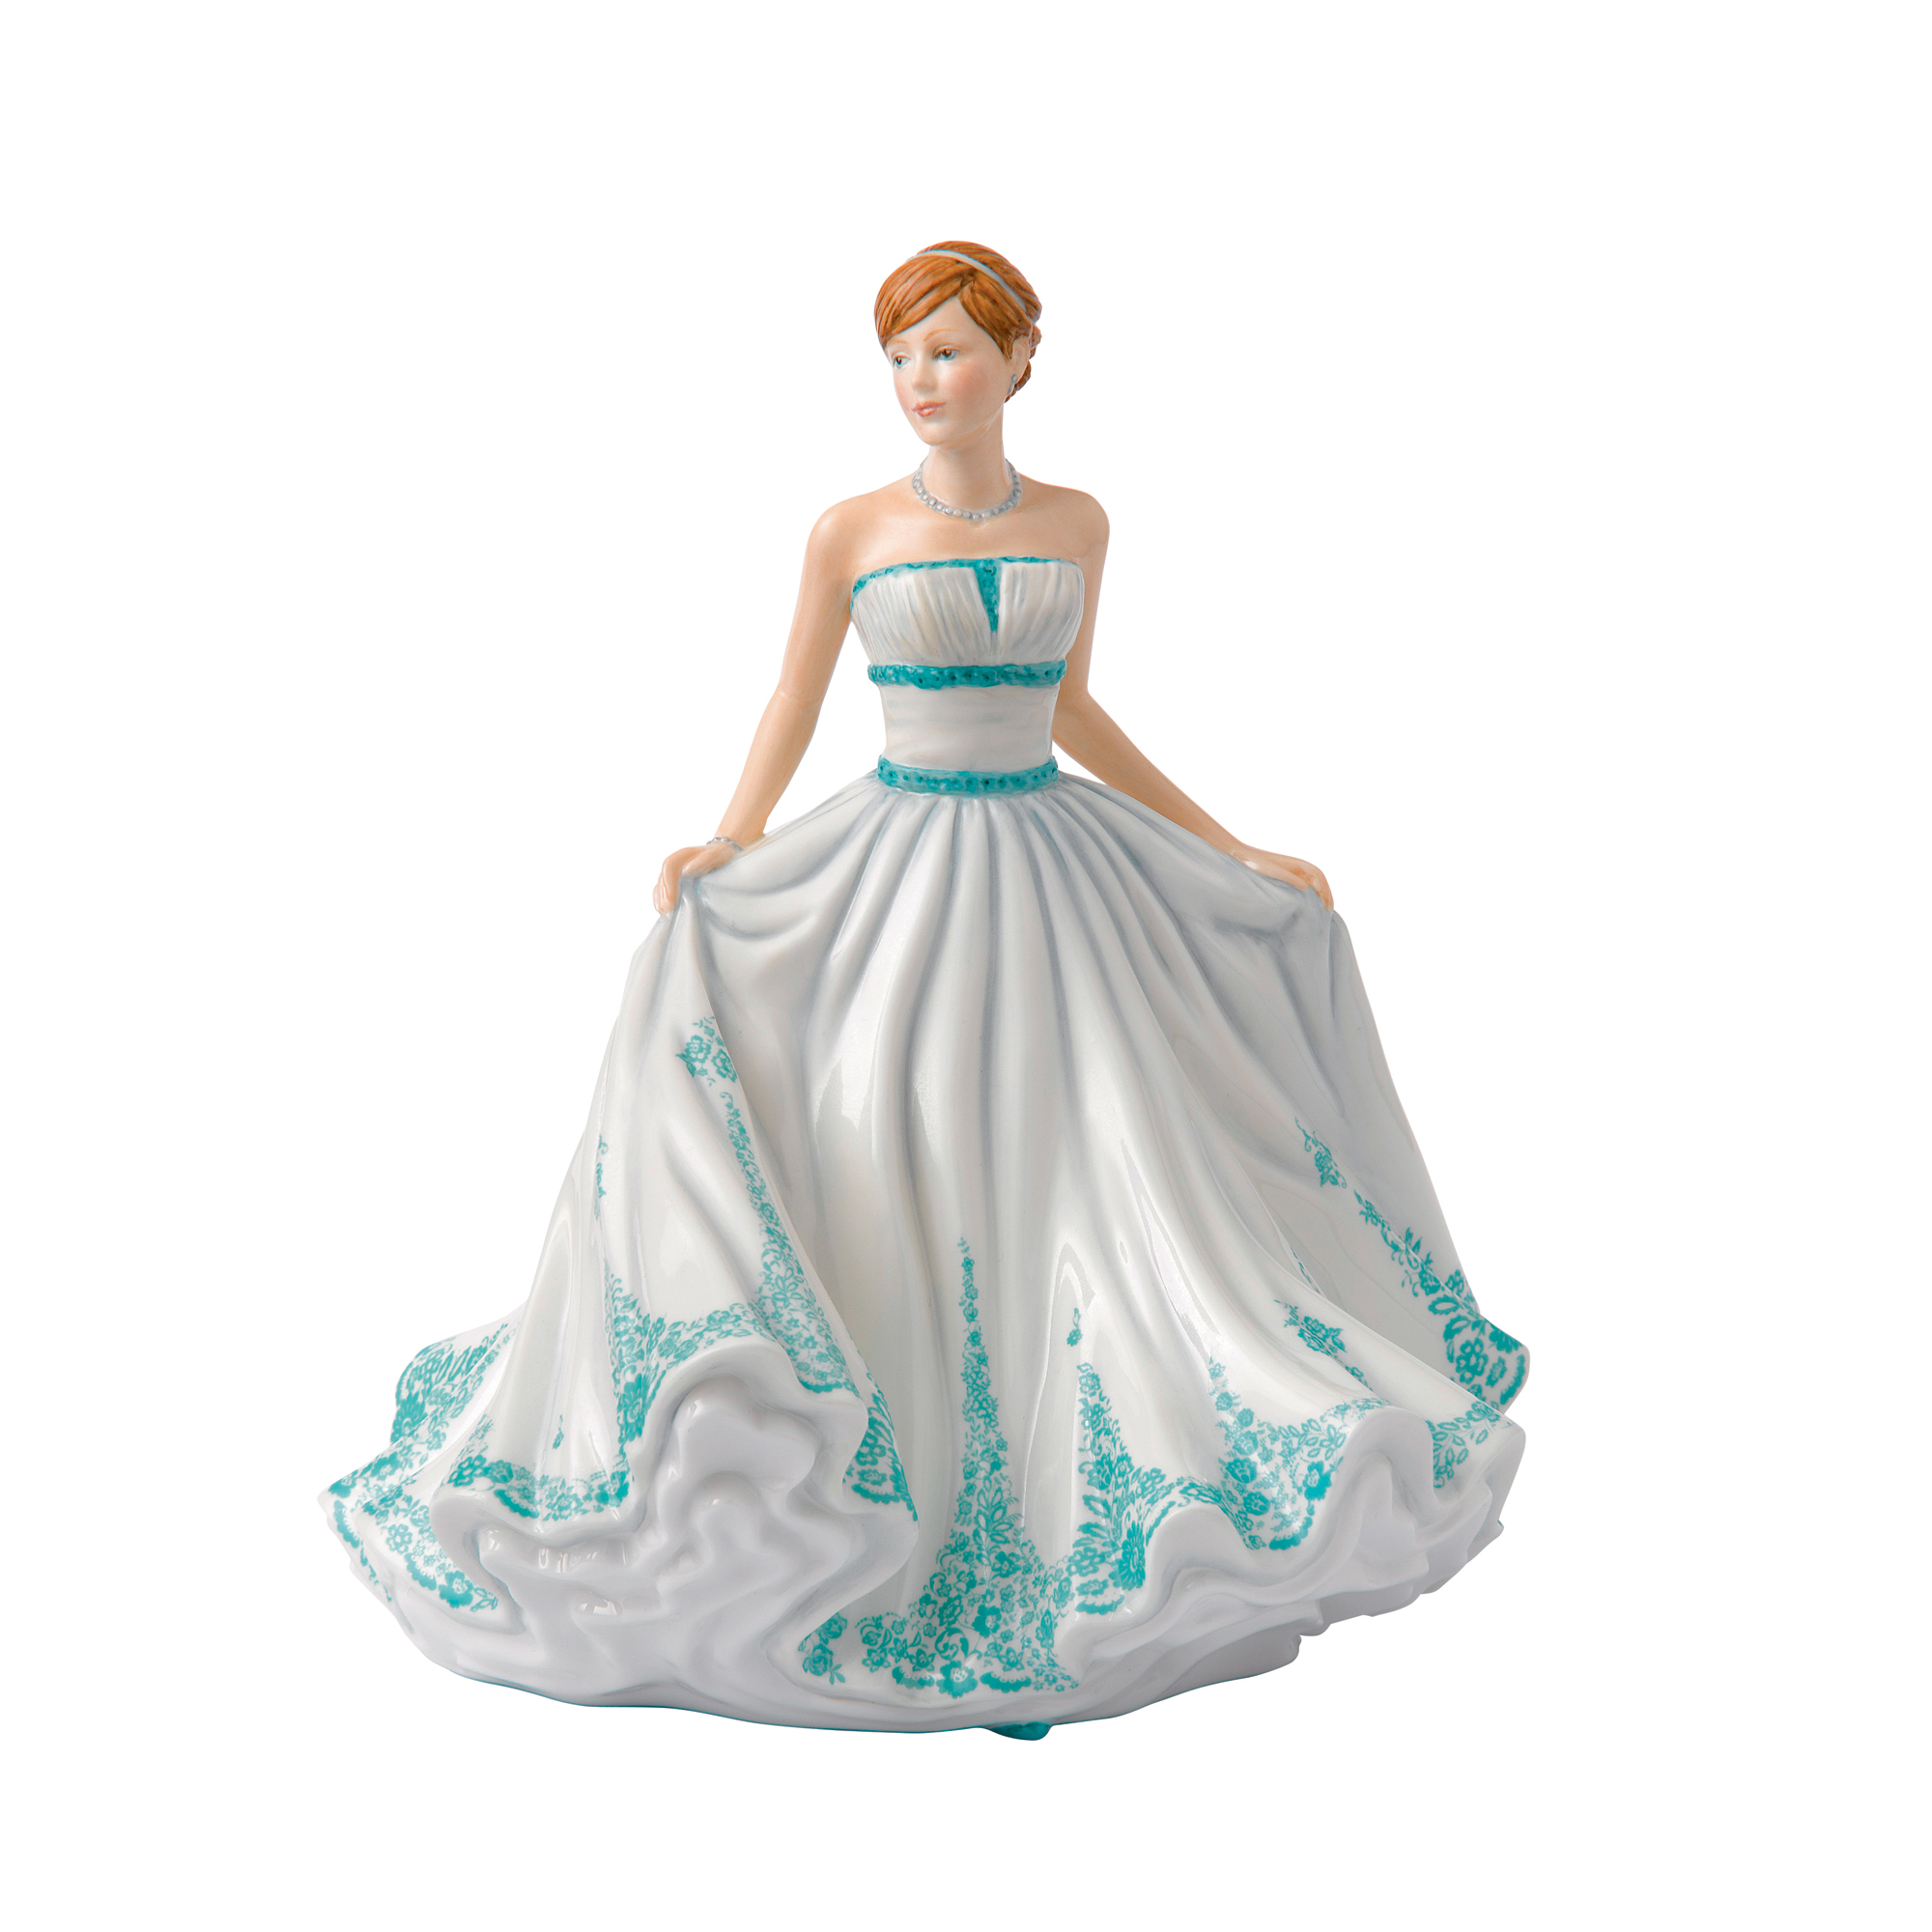 Elise HN5778 - Royal Doulton Figurine